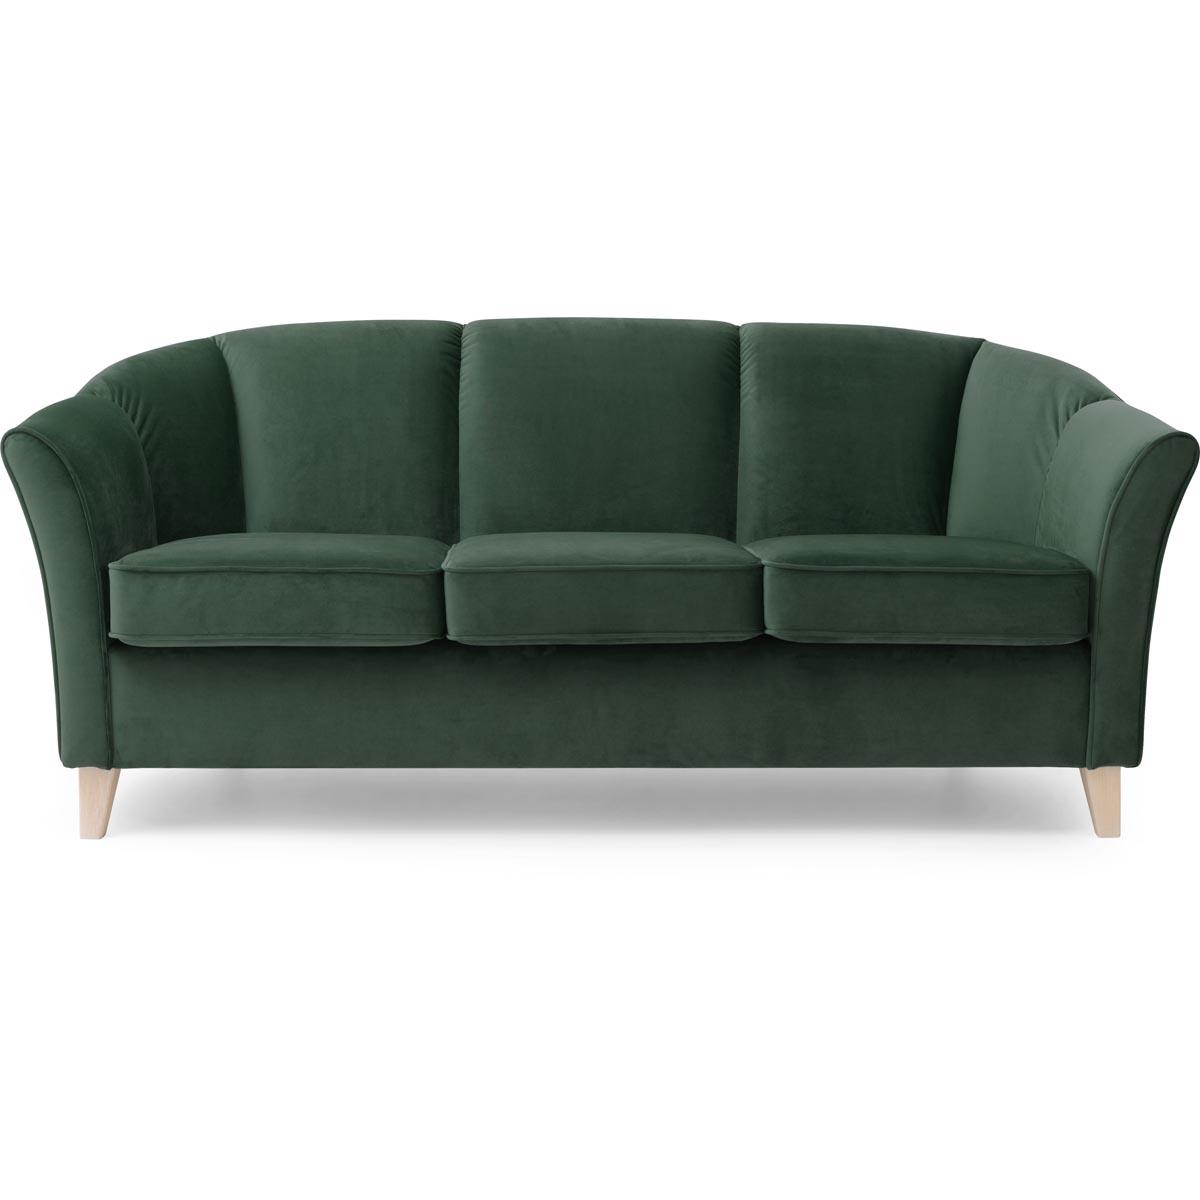 Ekerö soffa 3-sits tyg Monolith 37 grön